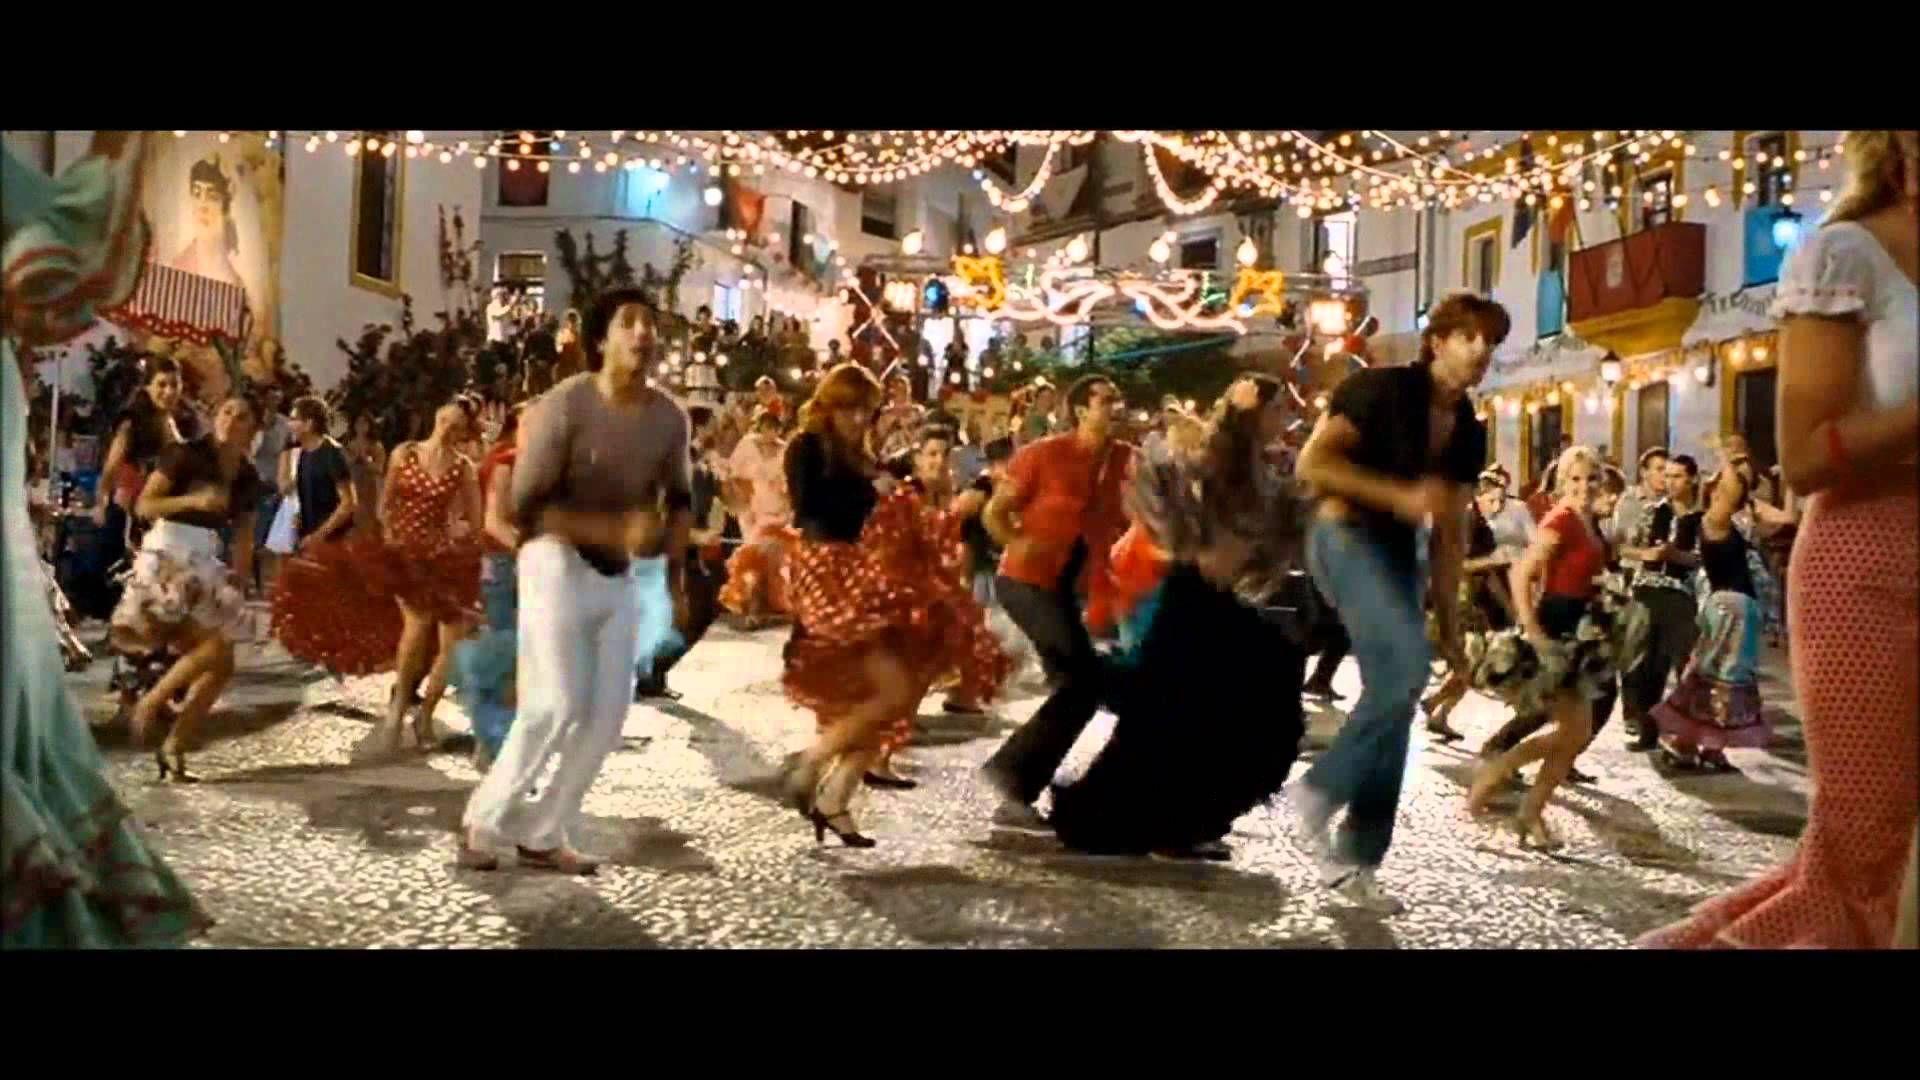 Senorita Zindagi Na Milegi Dobara Www Telexfree Com Ad Izumarco Bollywood Dance Desi Music Songs